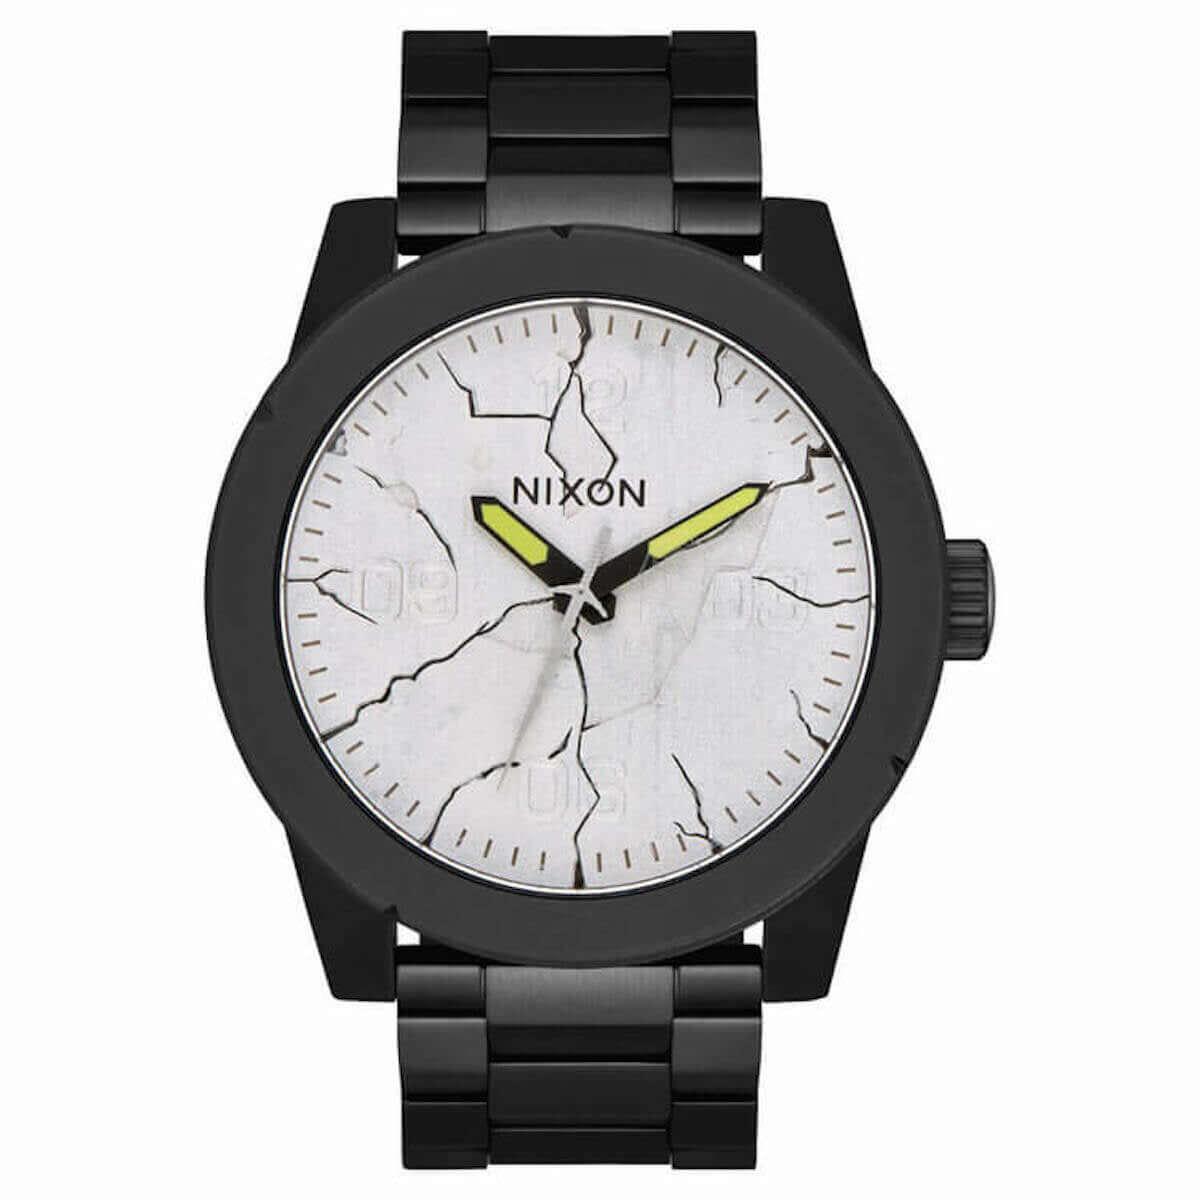 METALLICA X NIXON メタリカの名盤が腕時計に! music181112_nixon-metallica_9-1200x1200